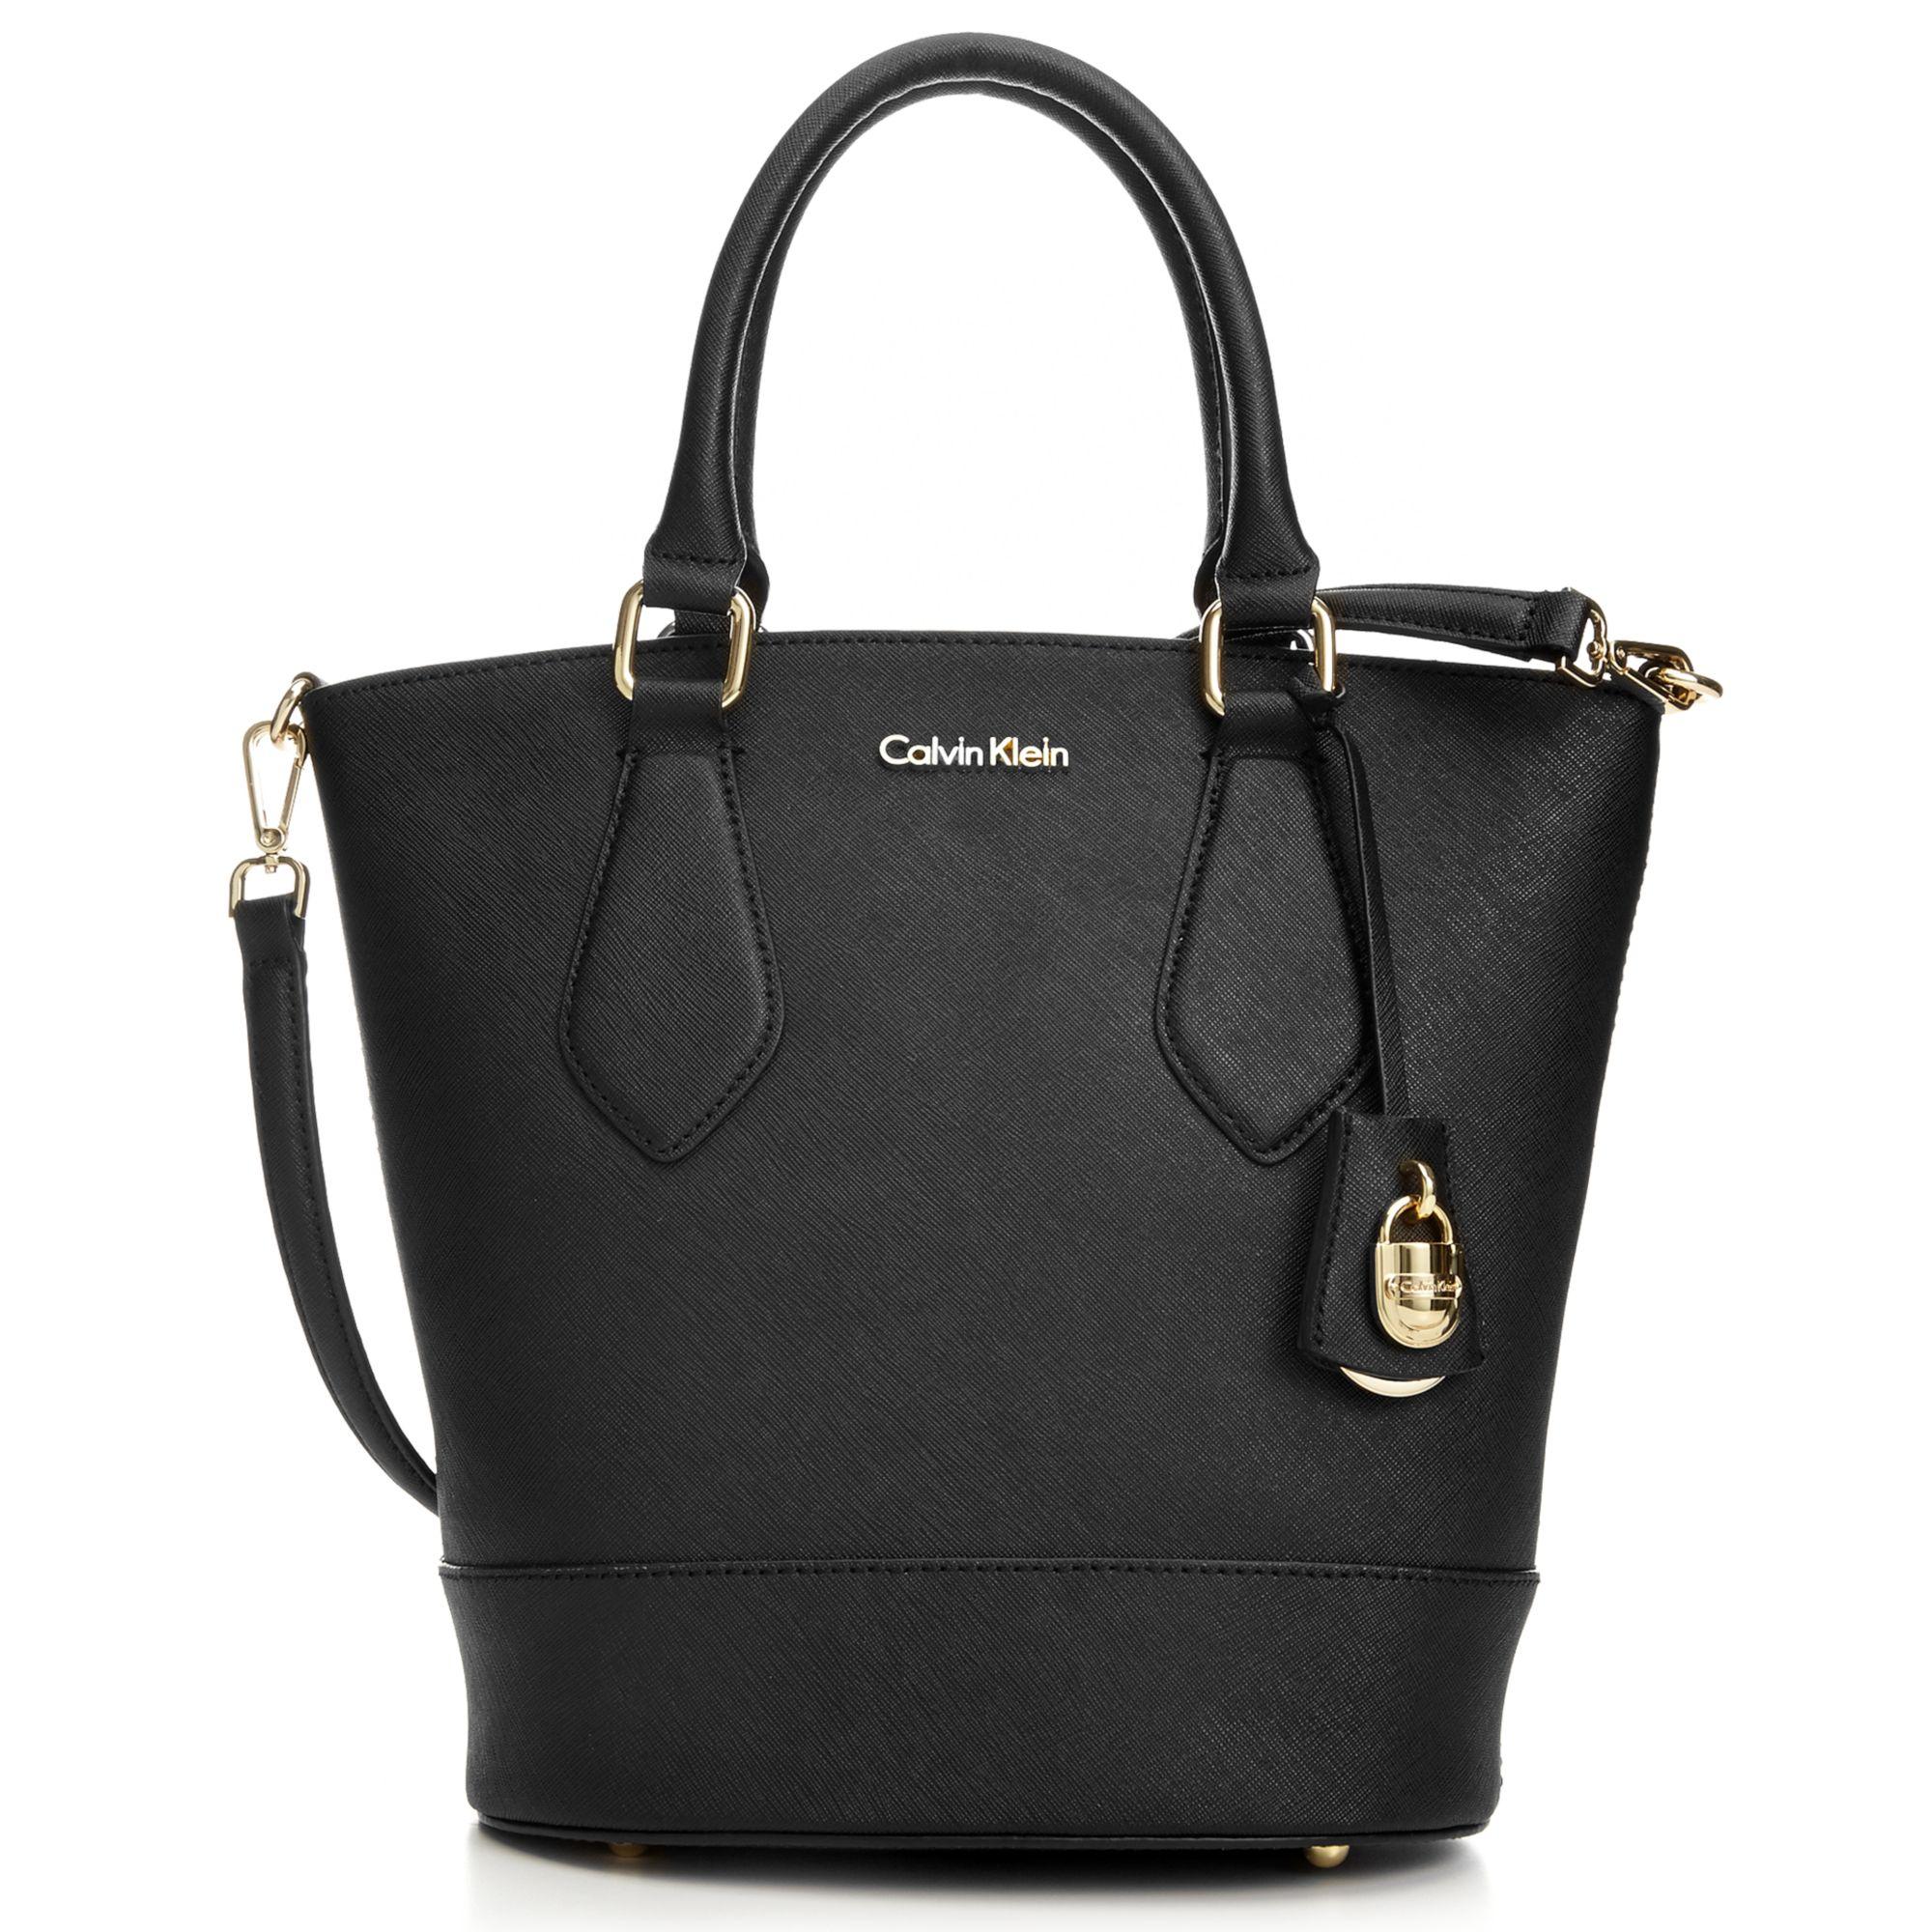 07e337acdf Calvin Klein Modena Saffiano Bucket Bag in Black - Lyst